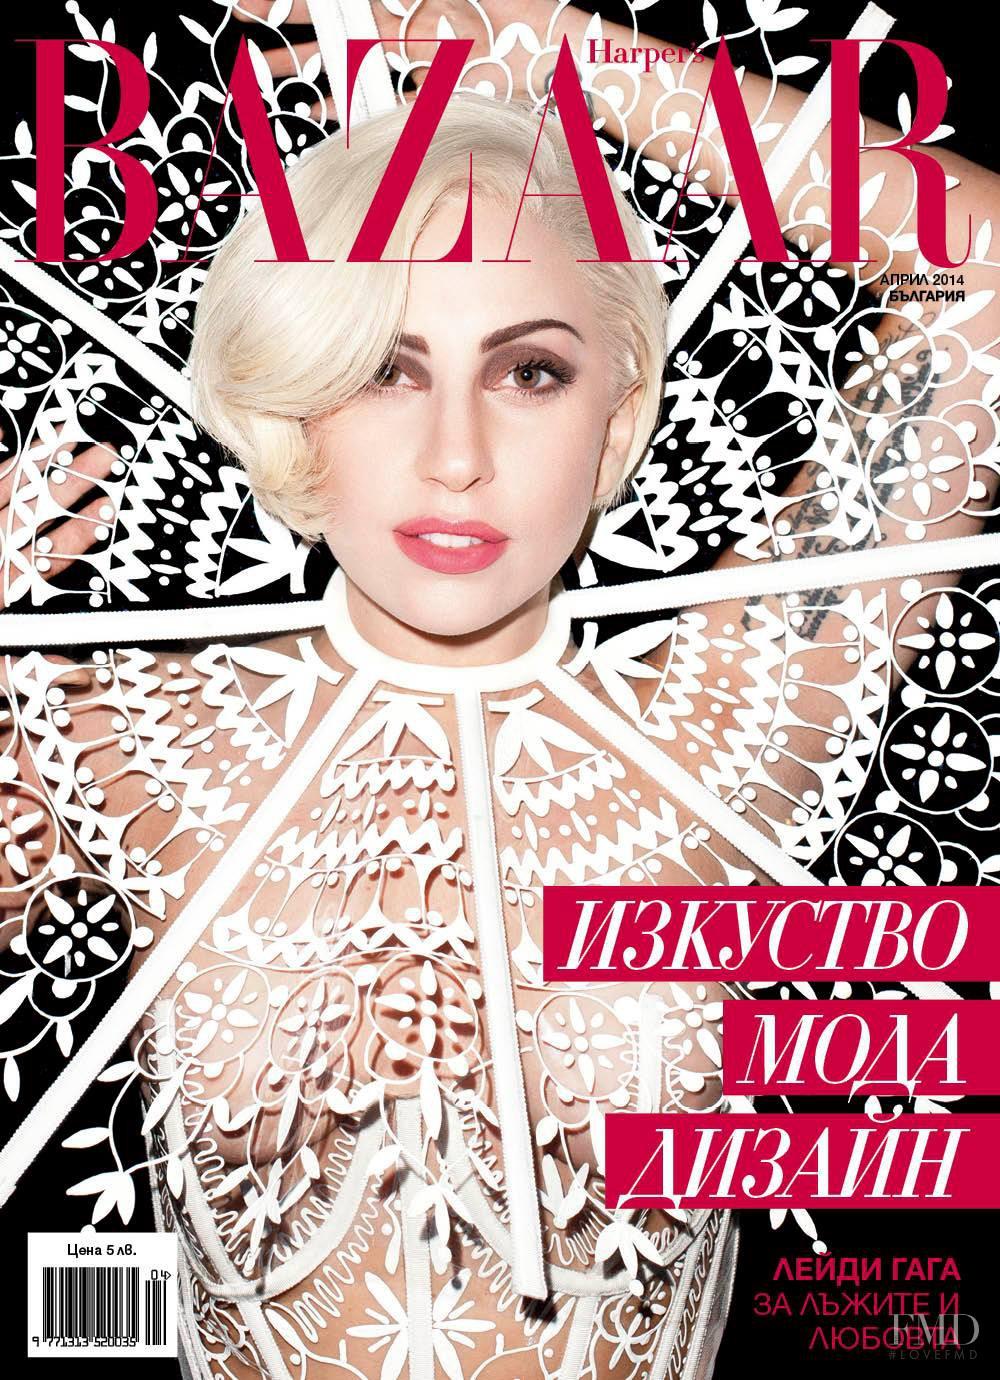 Cover of Harper's Bazaar Bulgaria with Lady Gaga, April ...